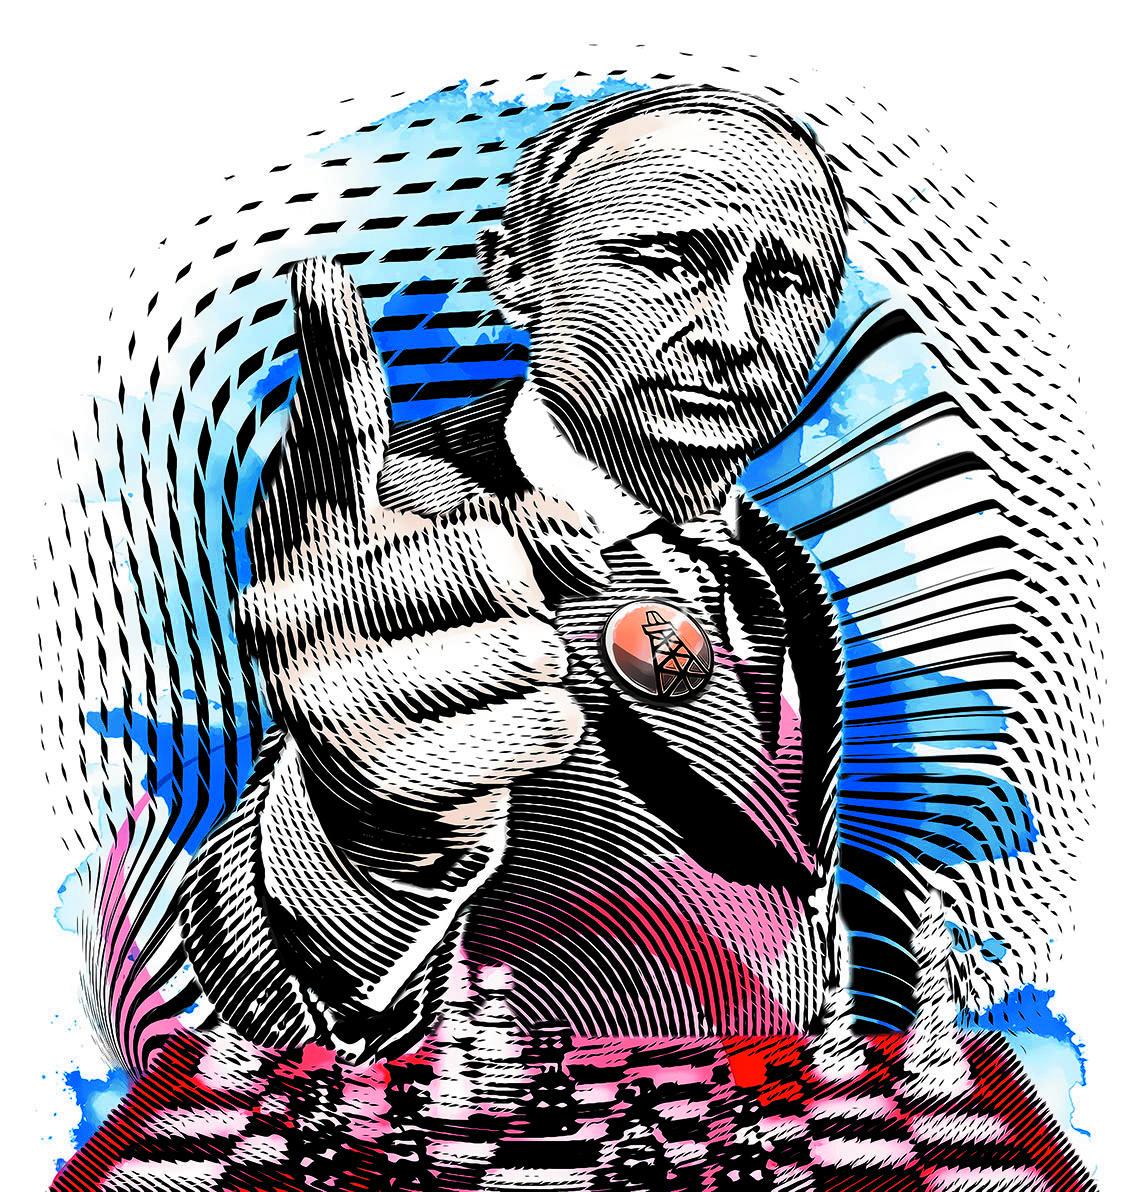 LM.GEOPOL - SOFT POWER I russie  guerre mediatique (2017 11 15) FR 1